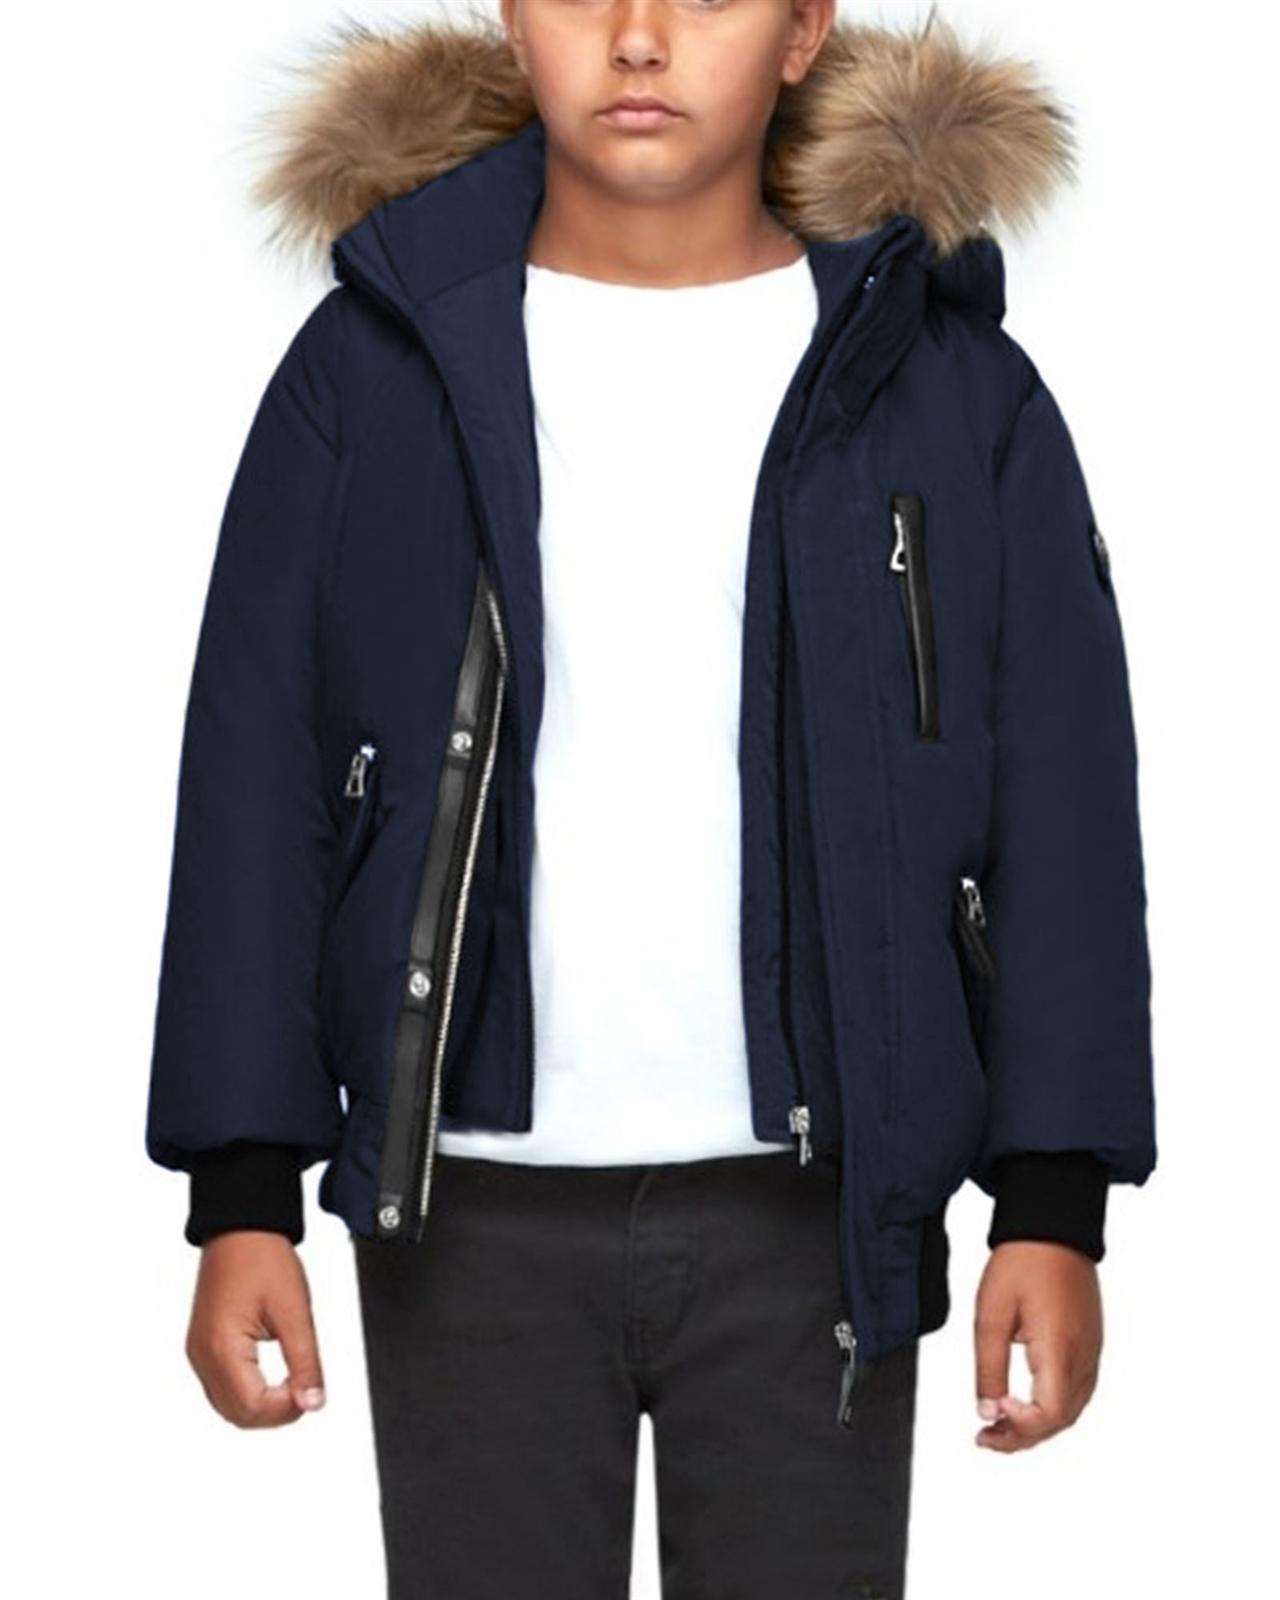 519d8ec07 Rudsak Boys Down Bomber Coat Micks - Rudsak Down Jackets Fall 2018 ...